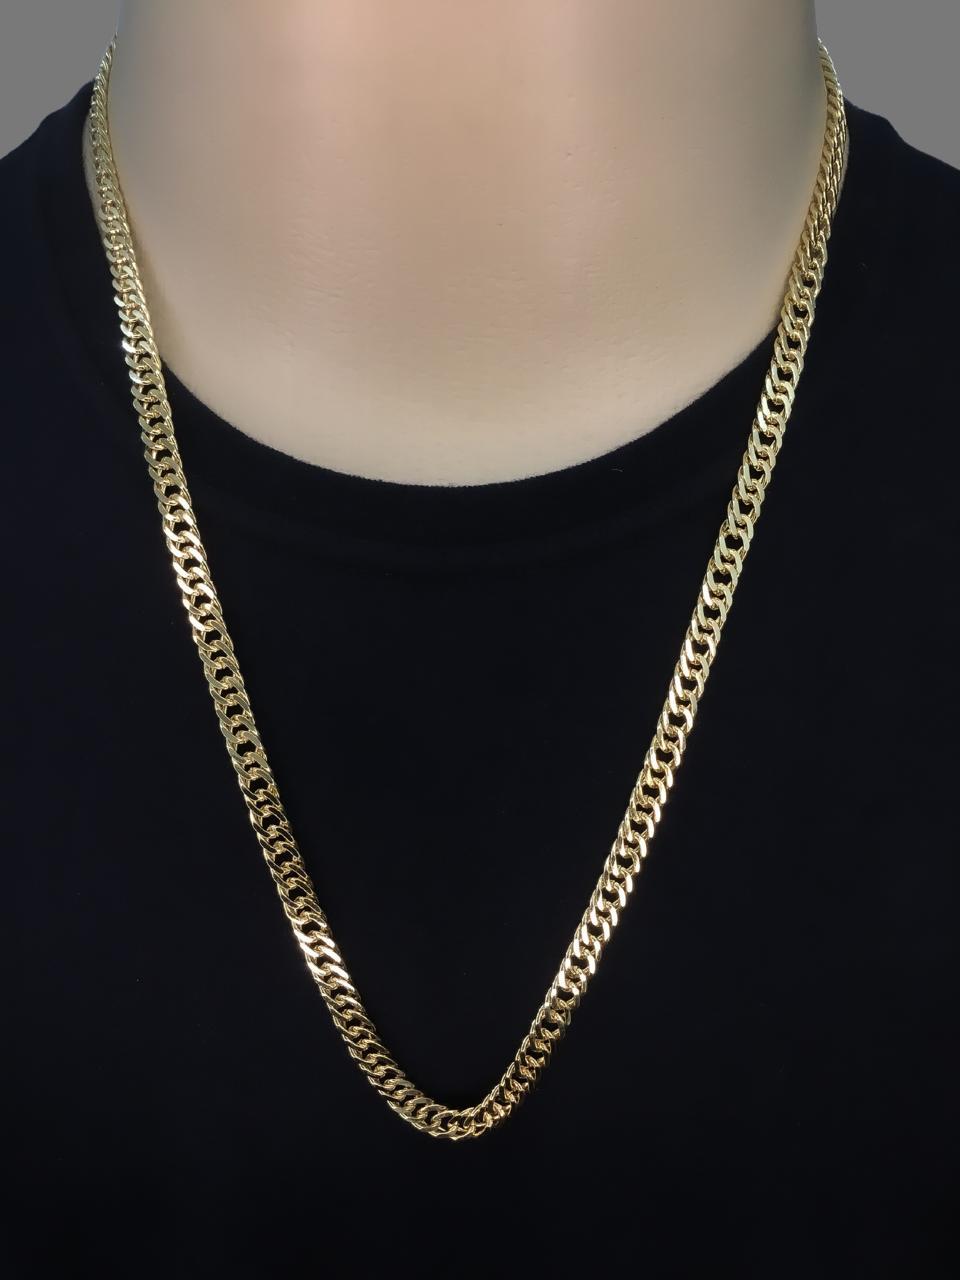 Corrente grumet malha dupla  -  6 milímetros - 70 Centímetros - fecho gaveta - Banhado a ouro 18 k